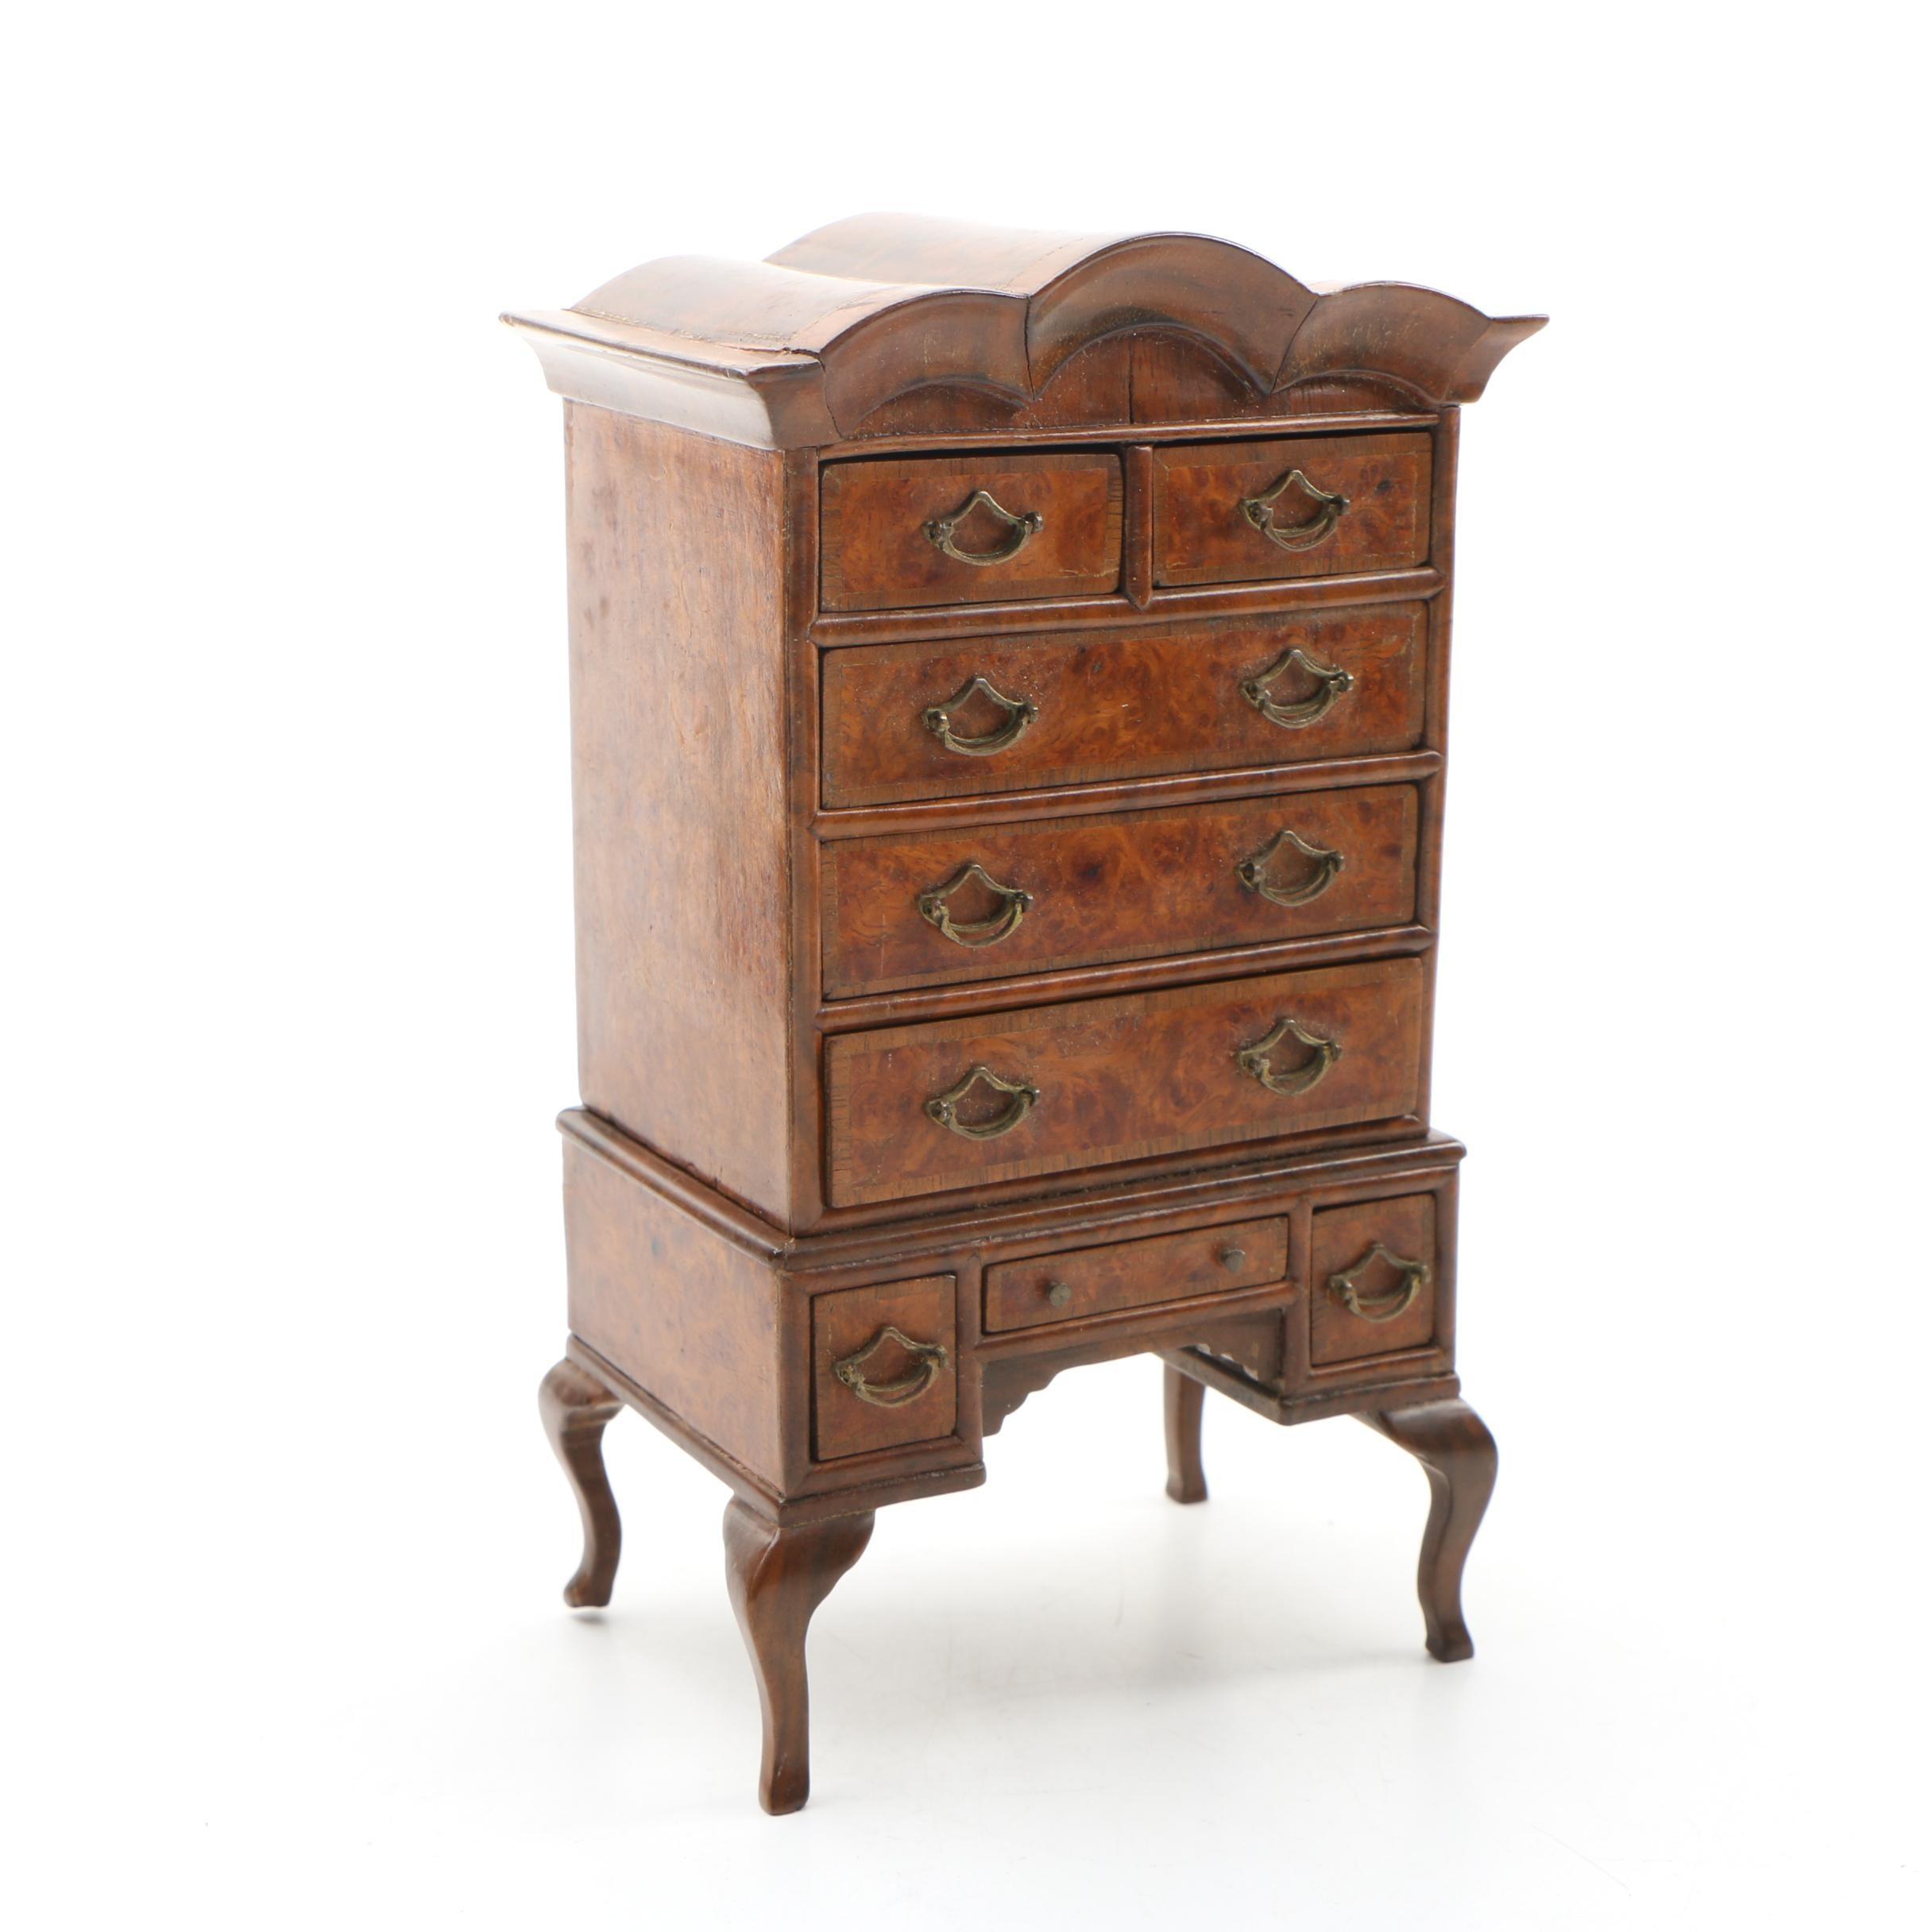 Handmade Miniature Queen Anne Style Burlwood Highboy Dresser